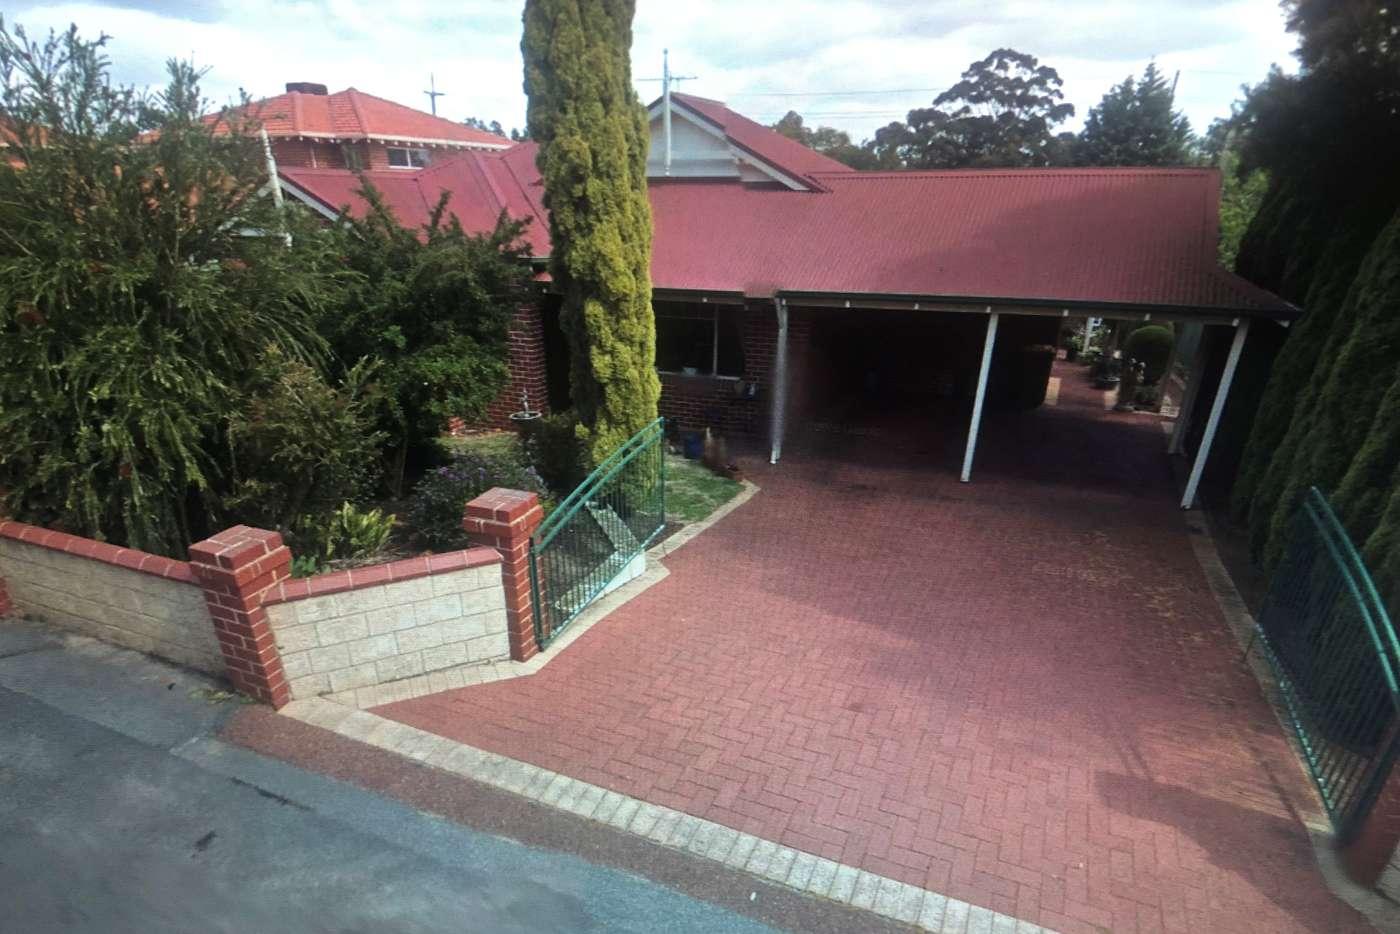 Main view of Homely house listing, 11 Poets Lane, Kalamunda WA 6076